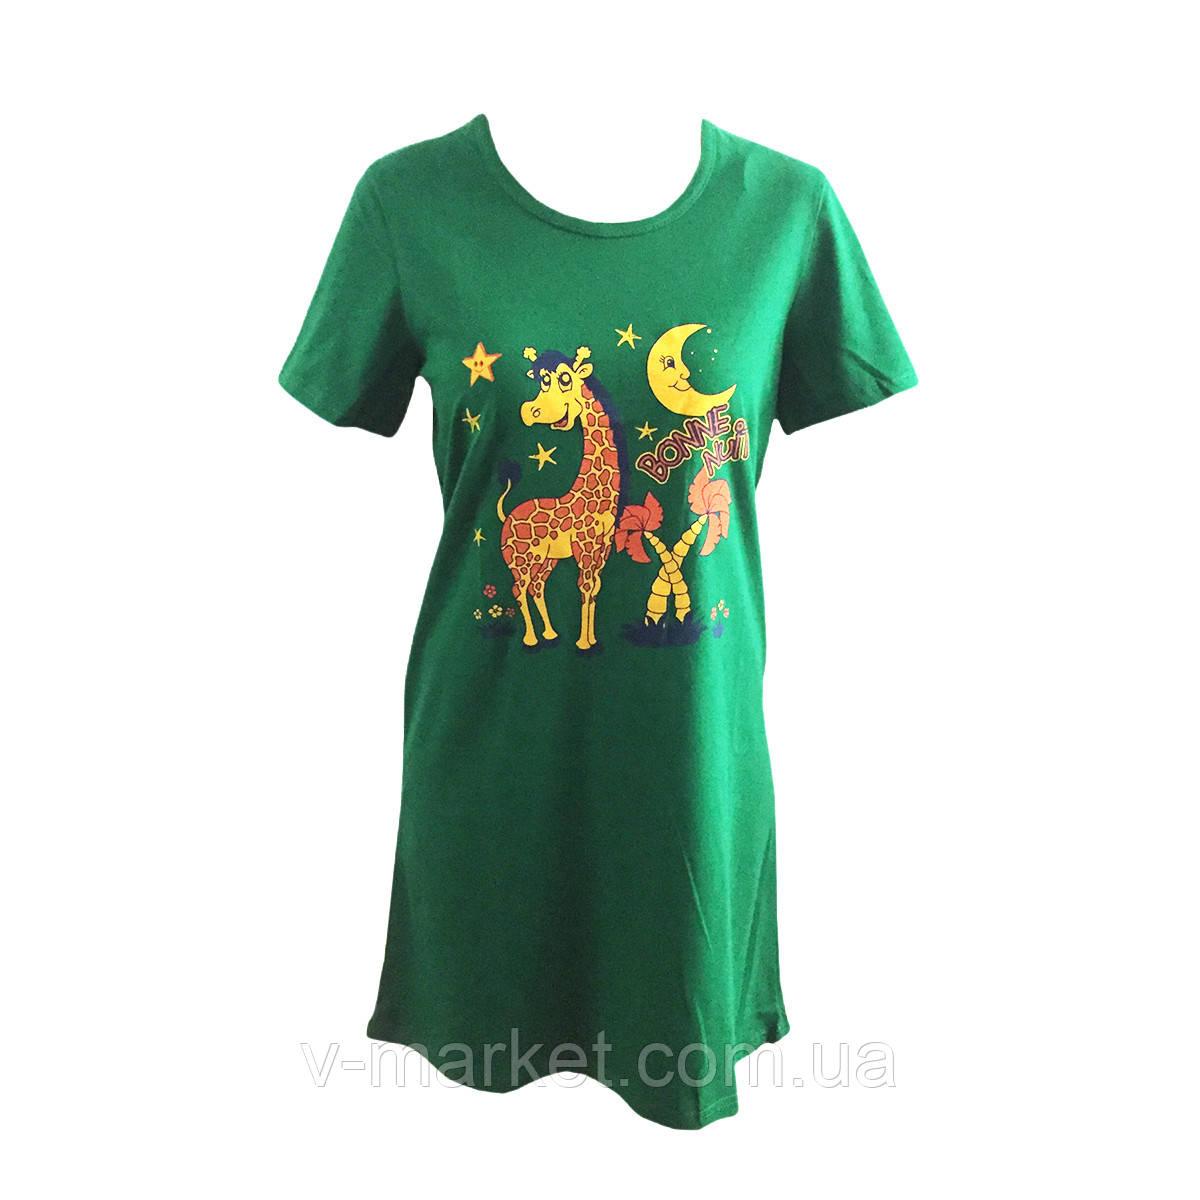 Летняя женская пижама футболка трикотажная, размеры 42-52